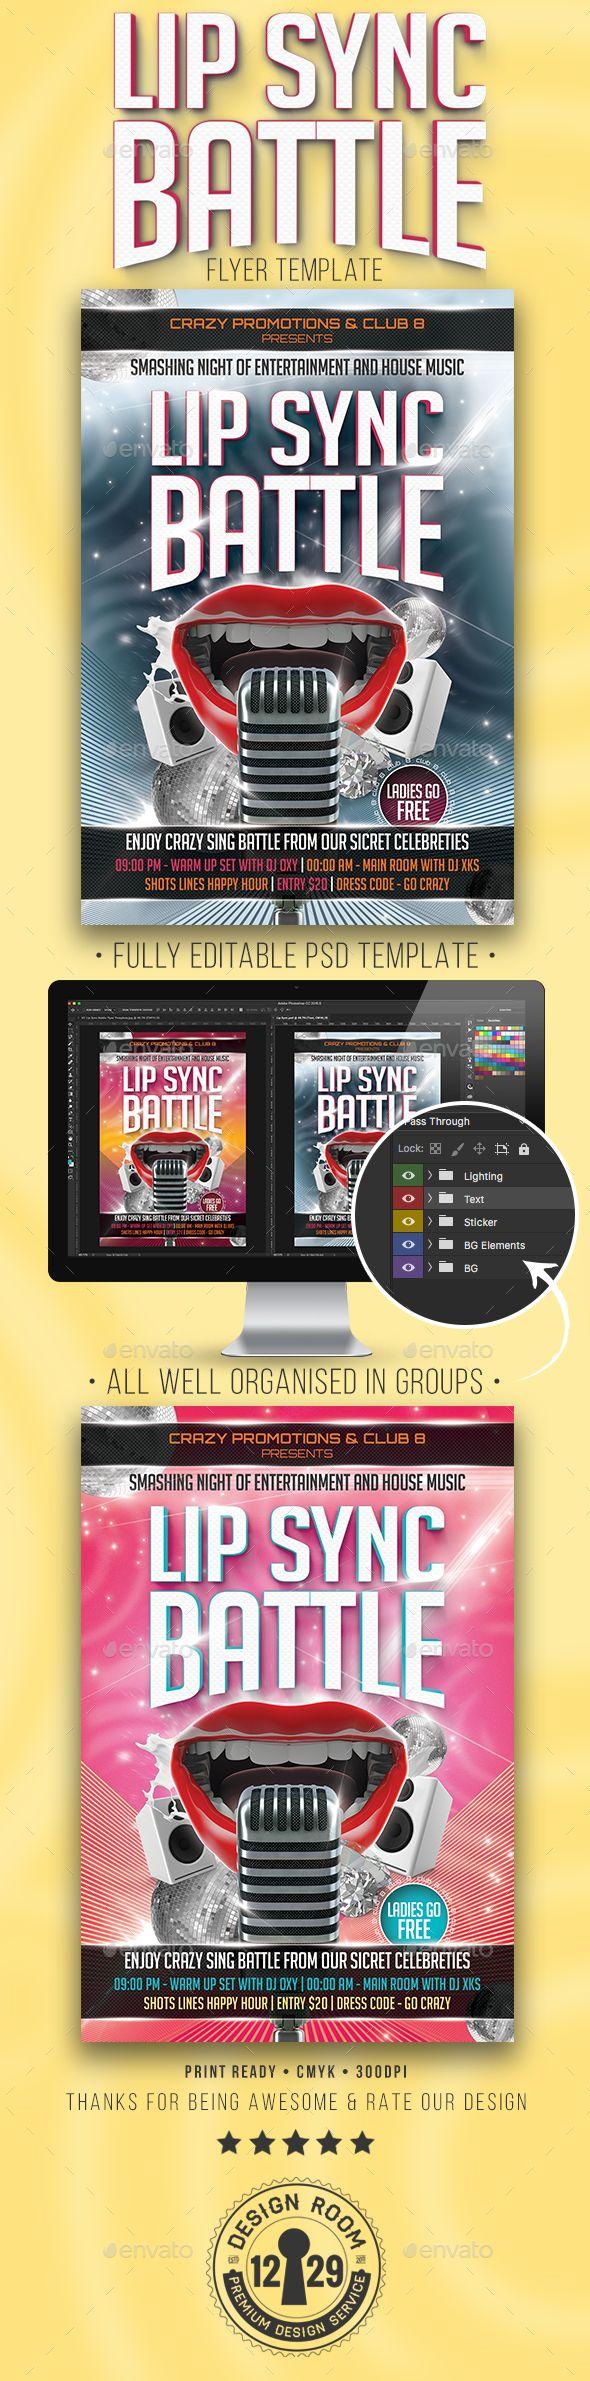 Lip Sync Battle Flyer Design Template - Events Flyers Template PSD. Download here: https://graphicriver.net/item/lip-sync-battle-flyer-template/17037438?s_rank=9&ref=yinkira